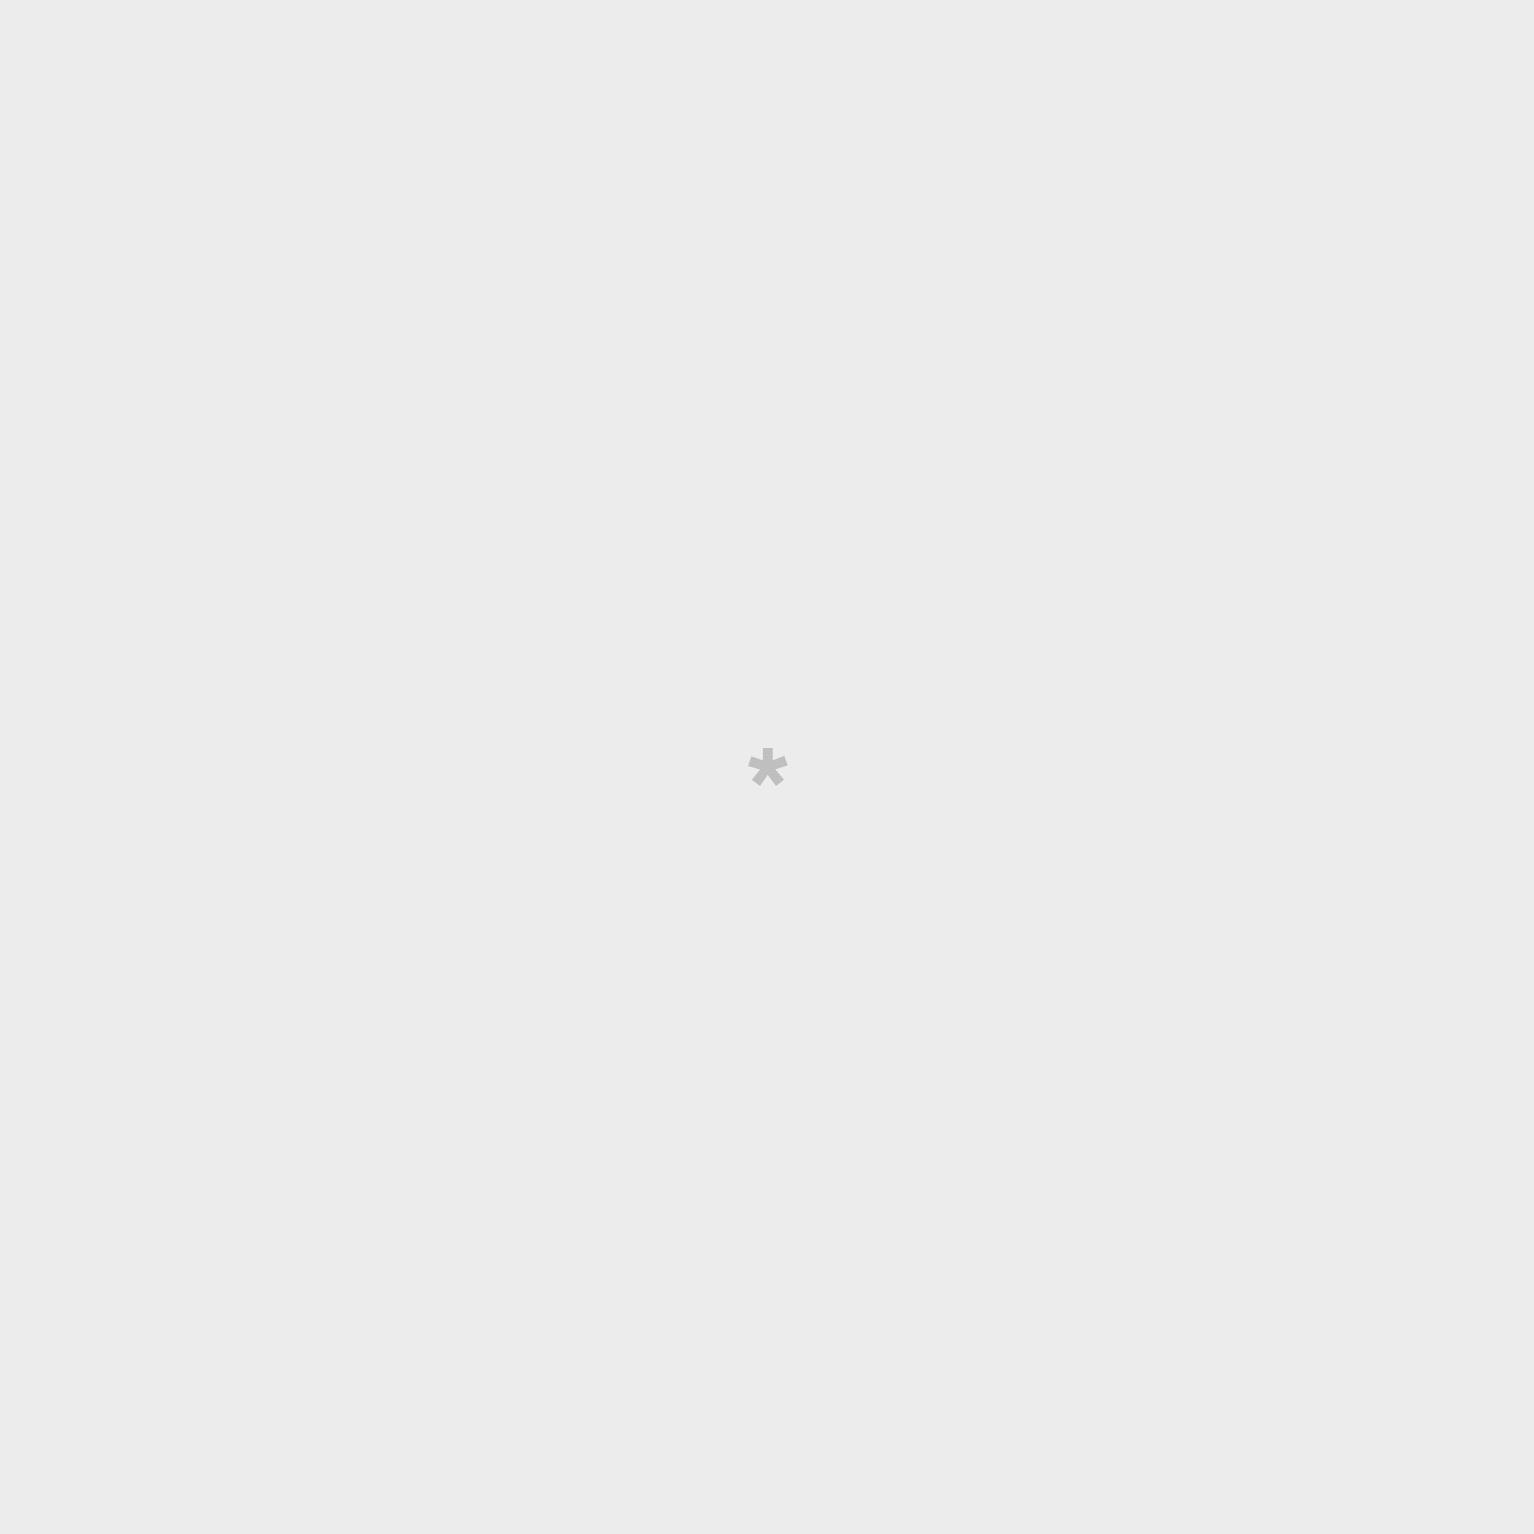 Notebook - The best adventures begin with...